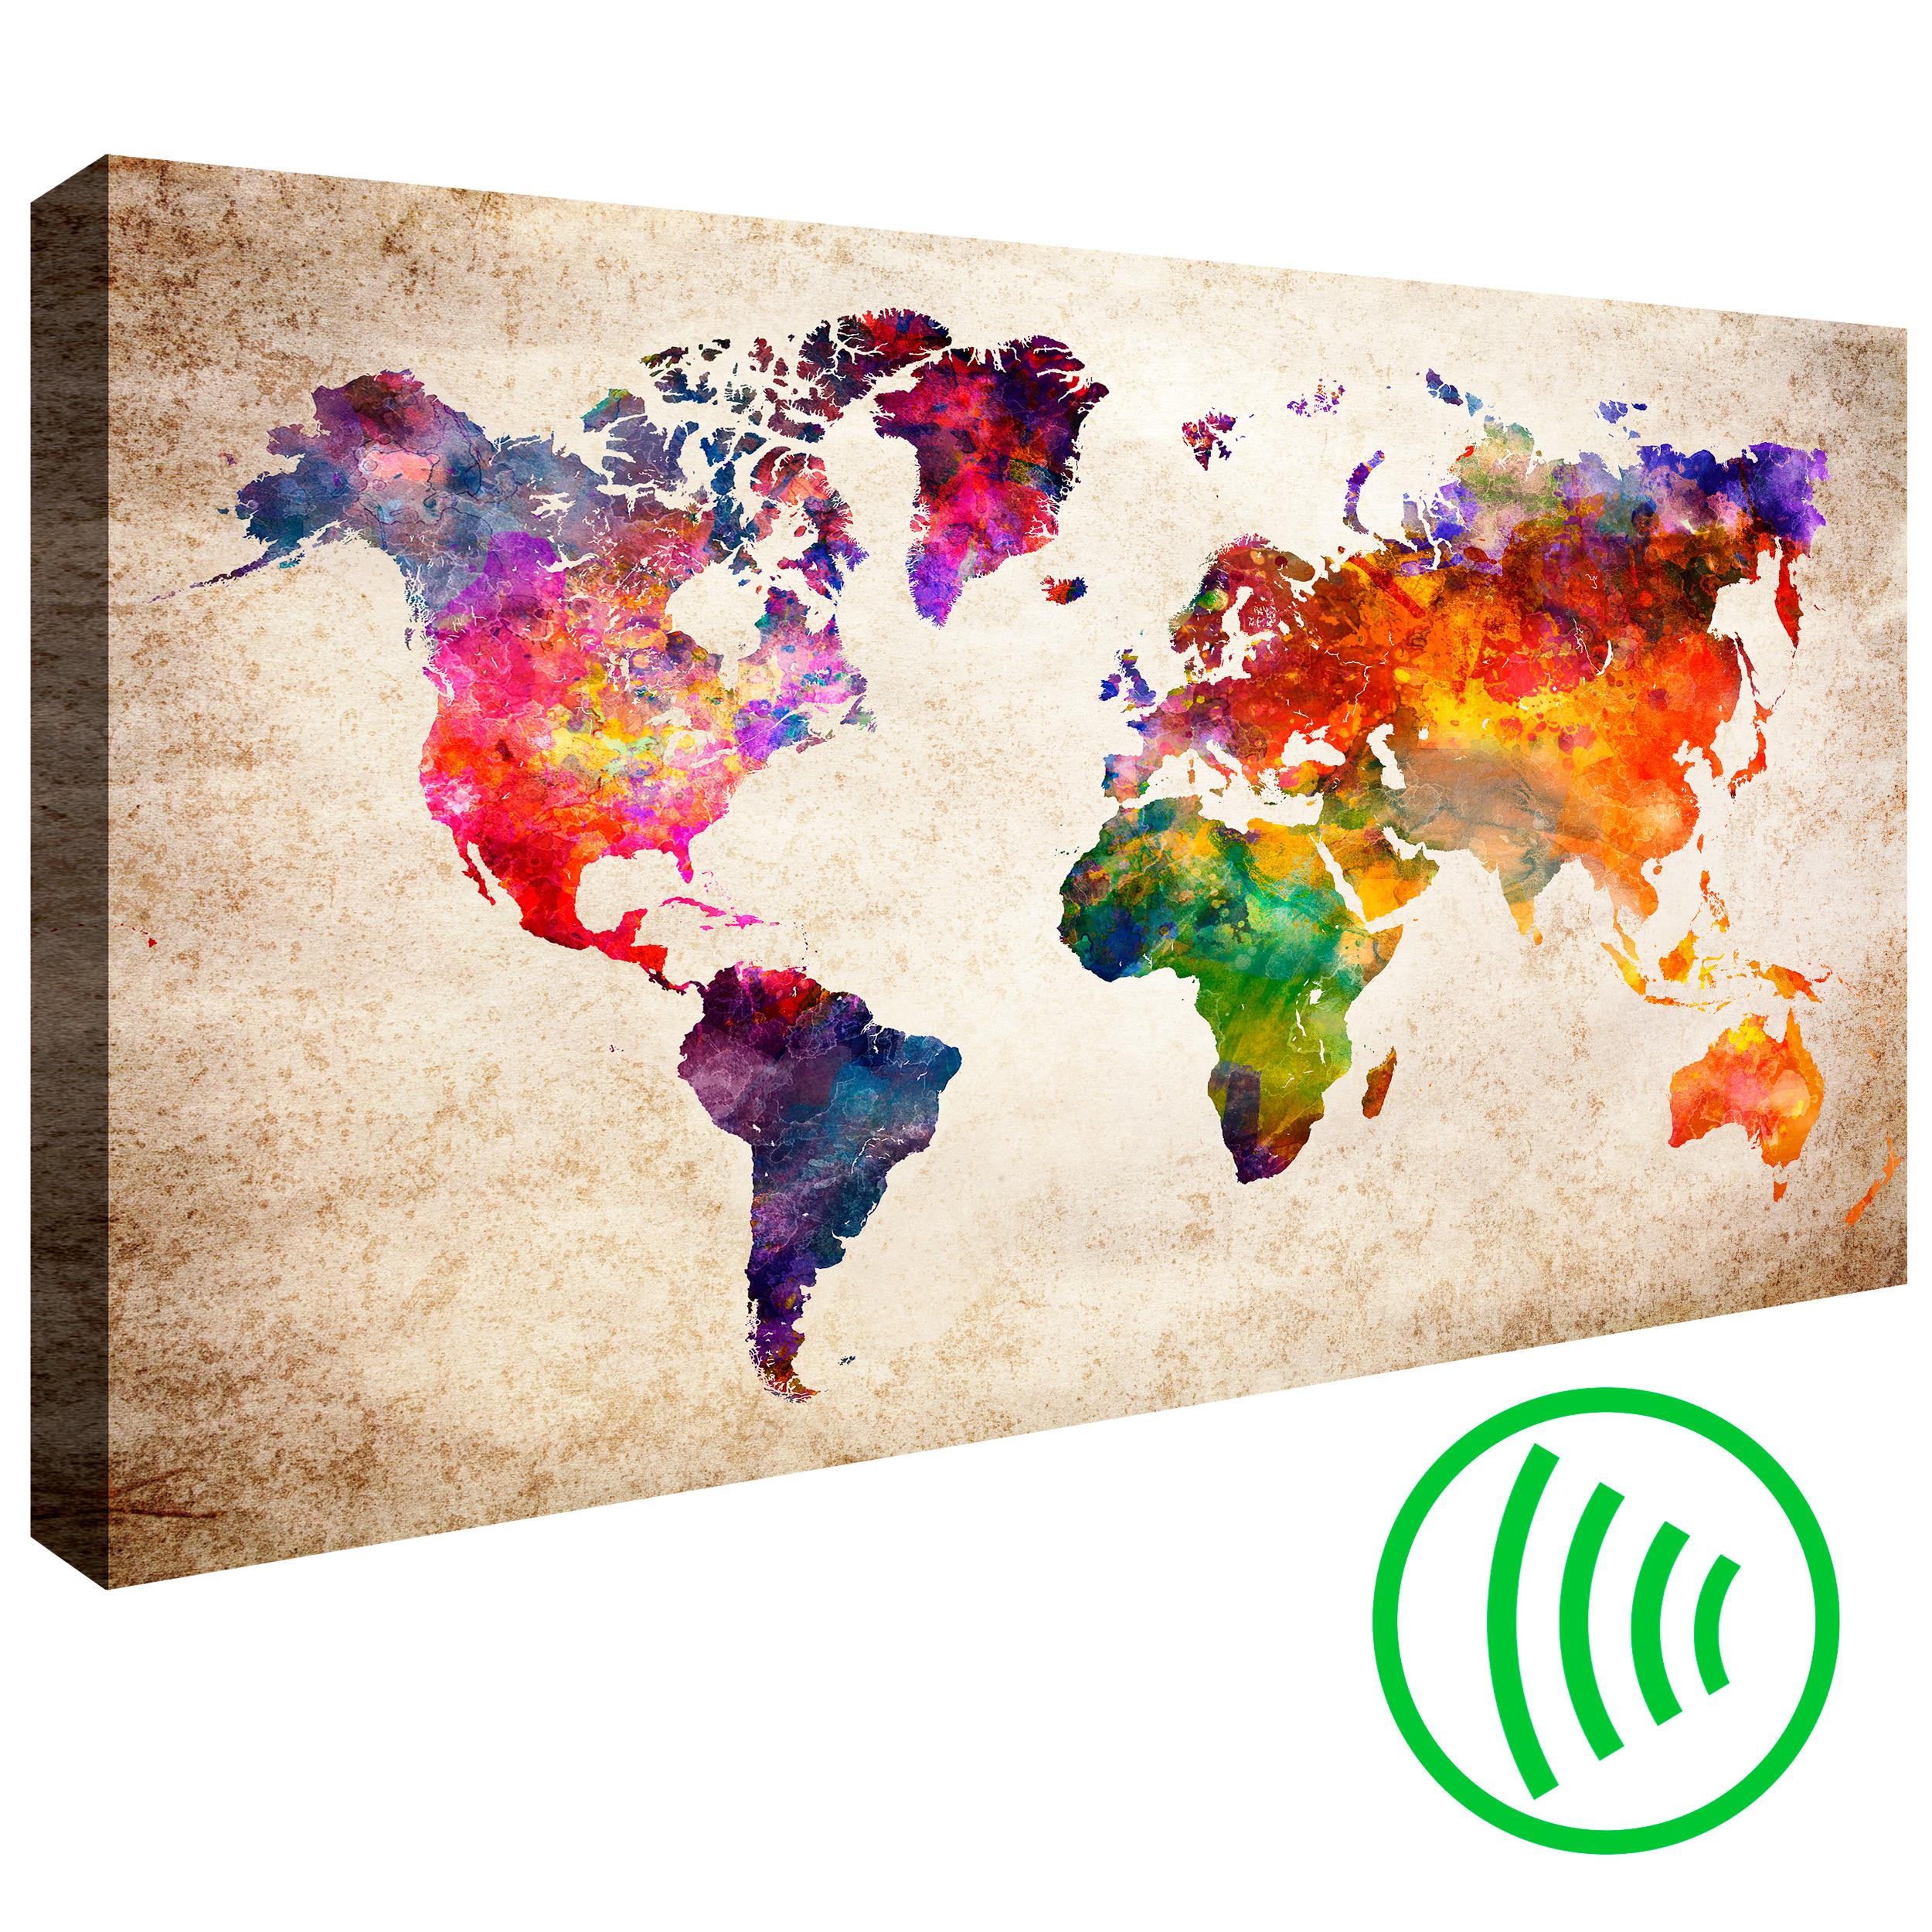 LEINWAND BILDER Weltkarte Aquarell Landkarte Akustikbild WANDBILDER kunstdruck